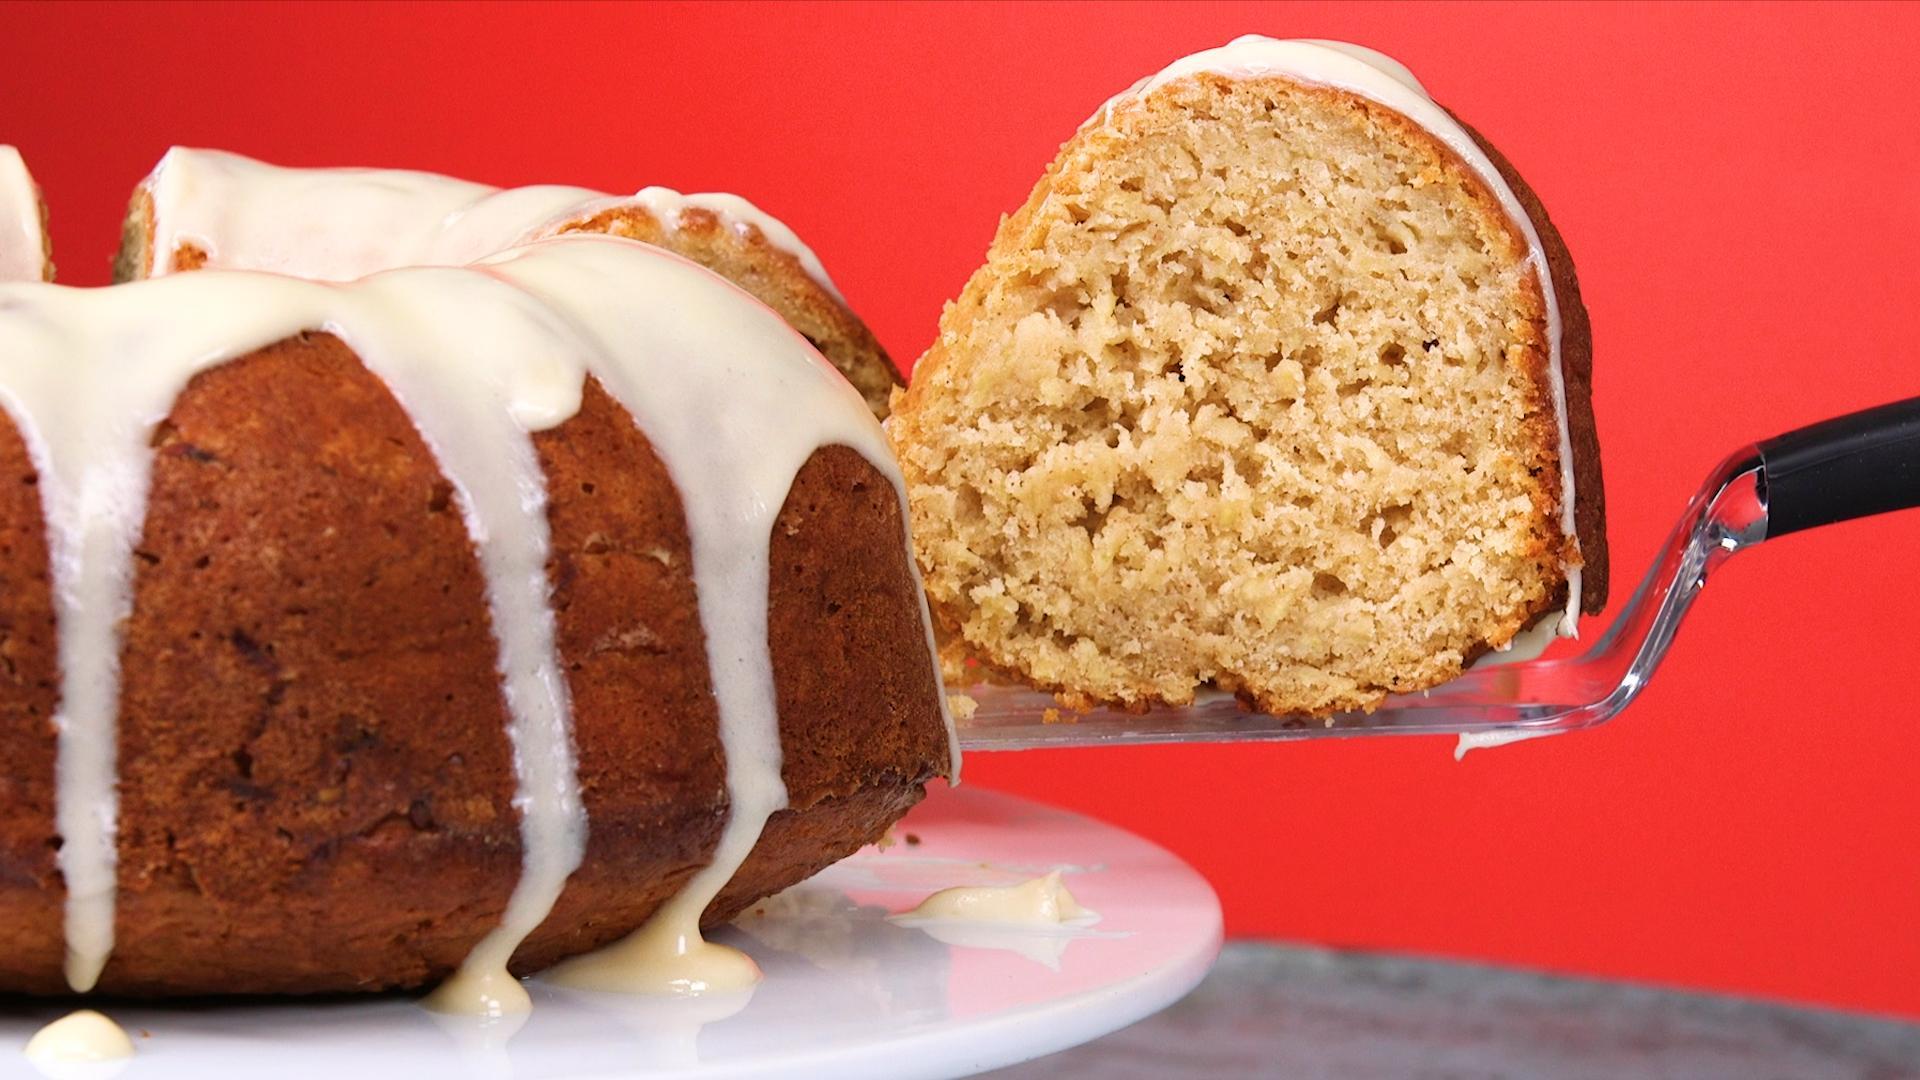 How To Make Apple Bundt Cake With Apple Cream Cheese Glaze Video Myrecipes